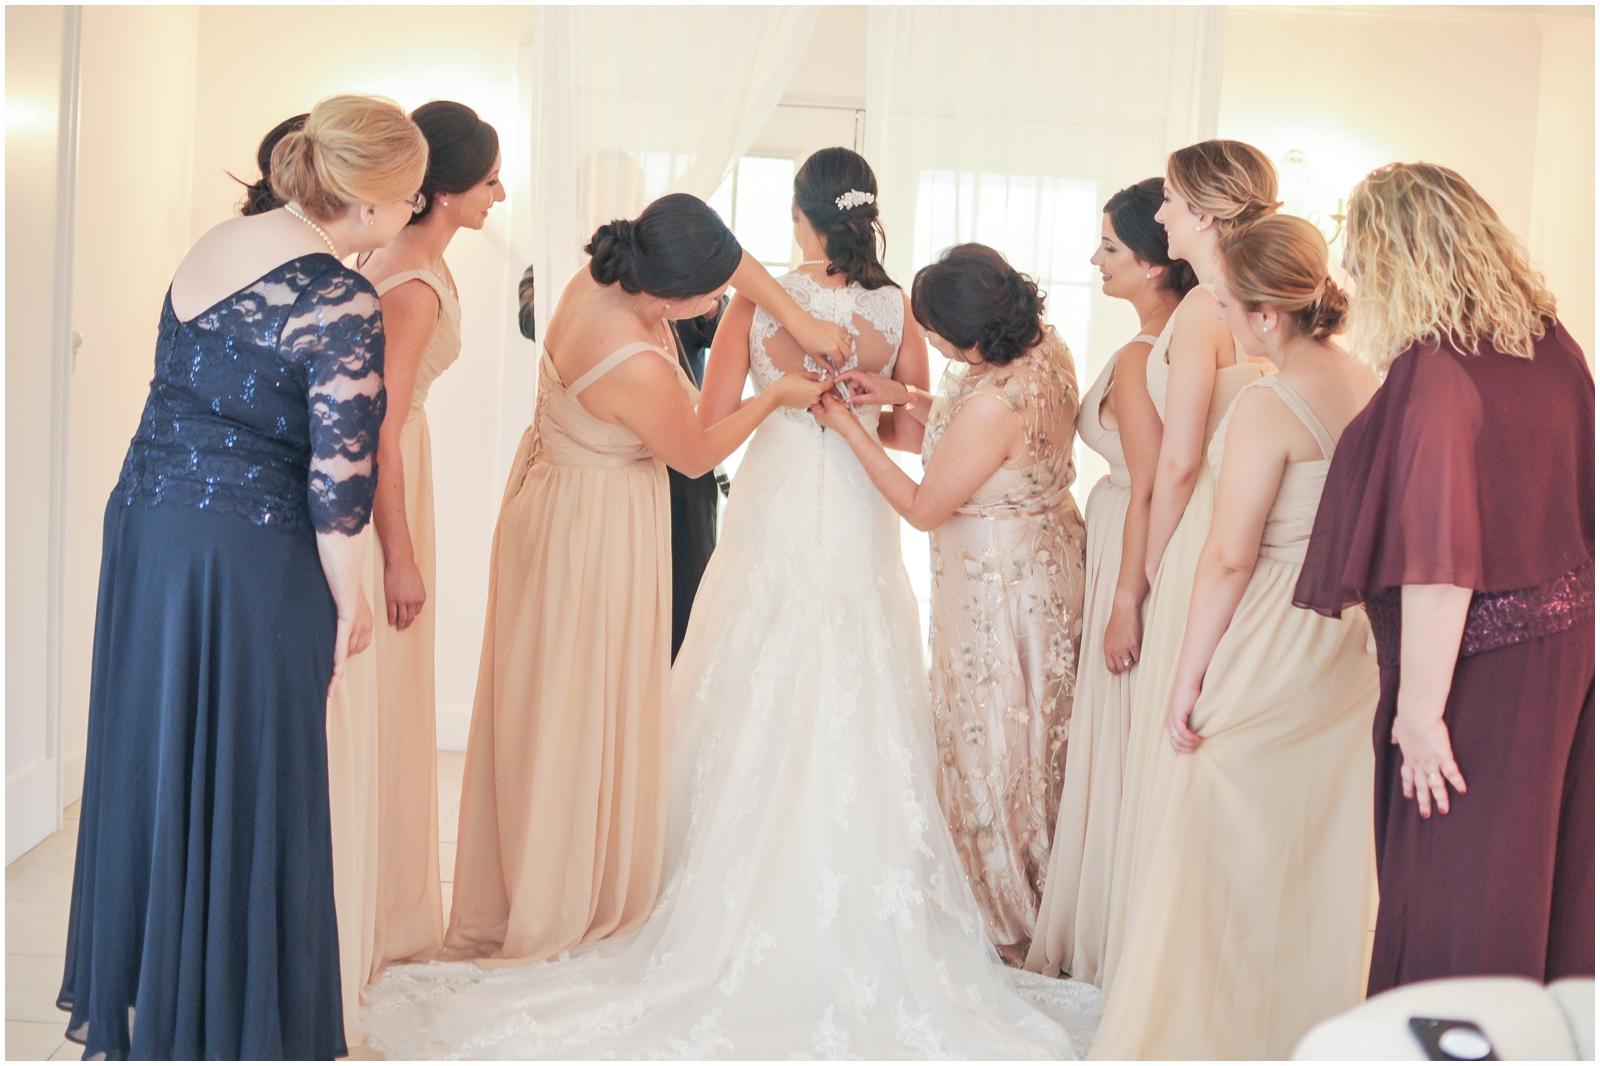 Rustic-Elegant-Wedding-Venue-in-Tampa-Stonebridge-Events_0417.jpg